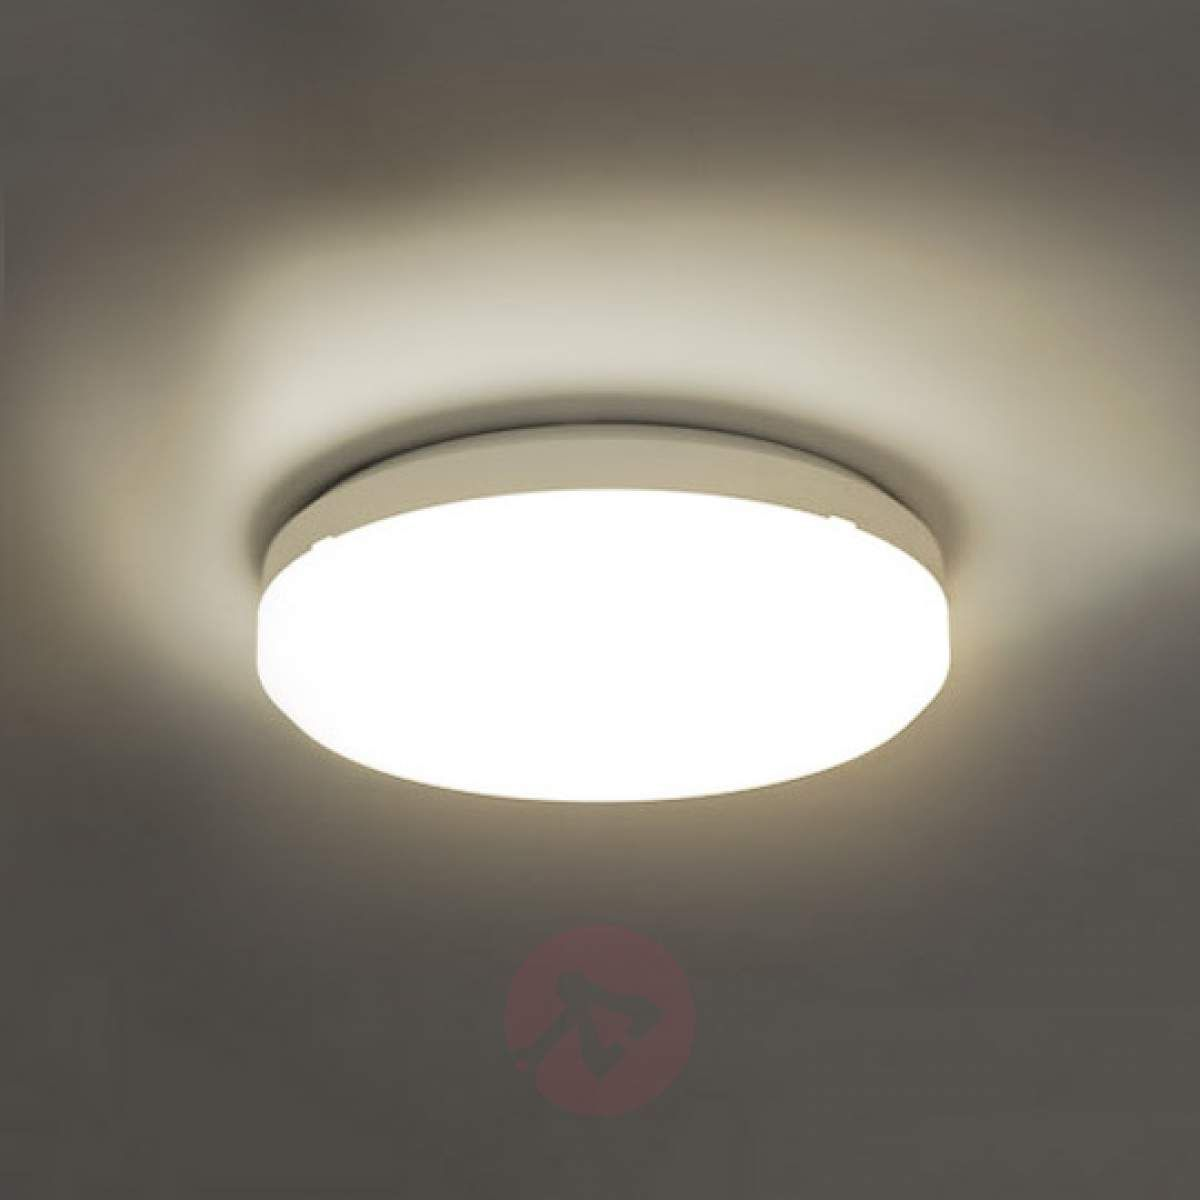 Sun 15 Lampa Sufitowa Led Ip65 26 W 3000k In 2019 Lampy